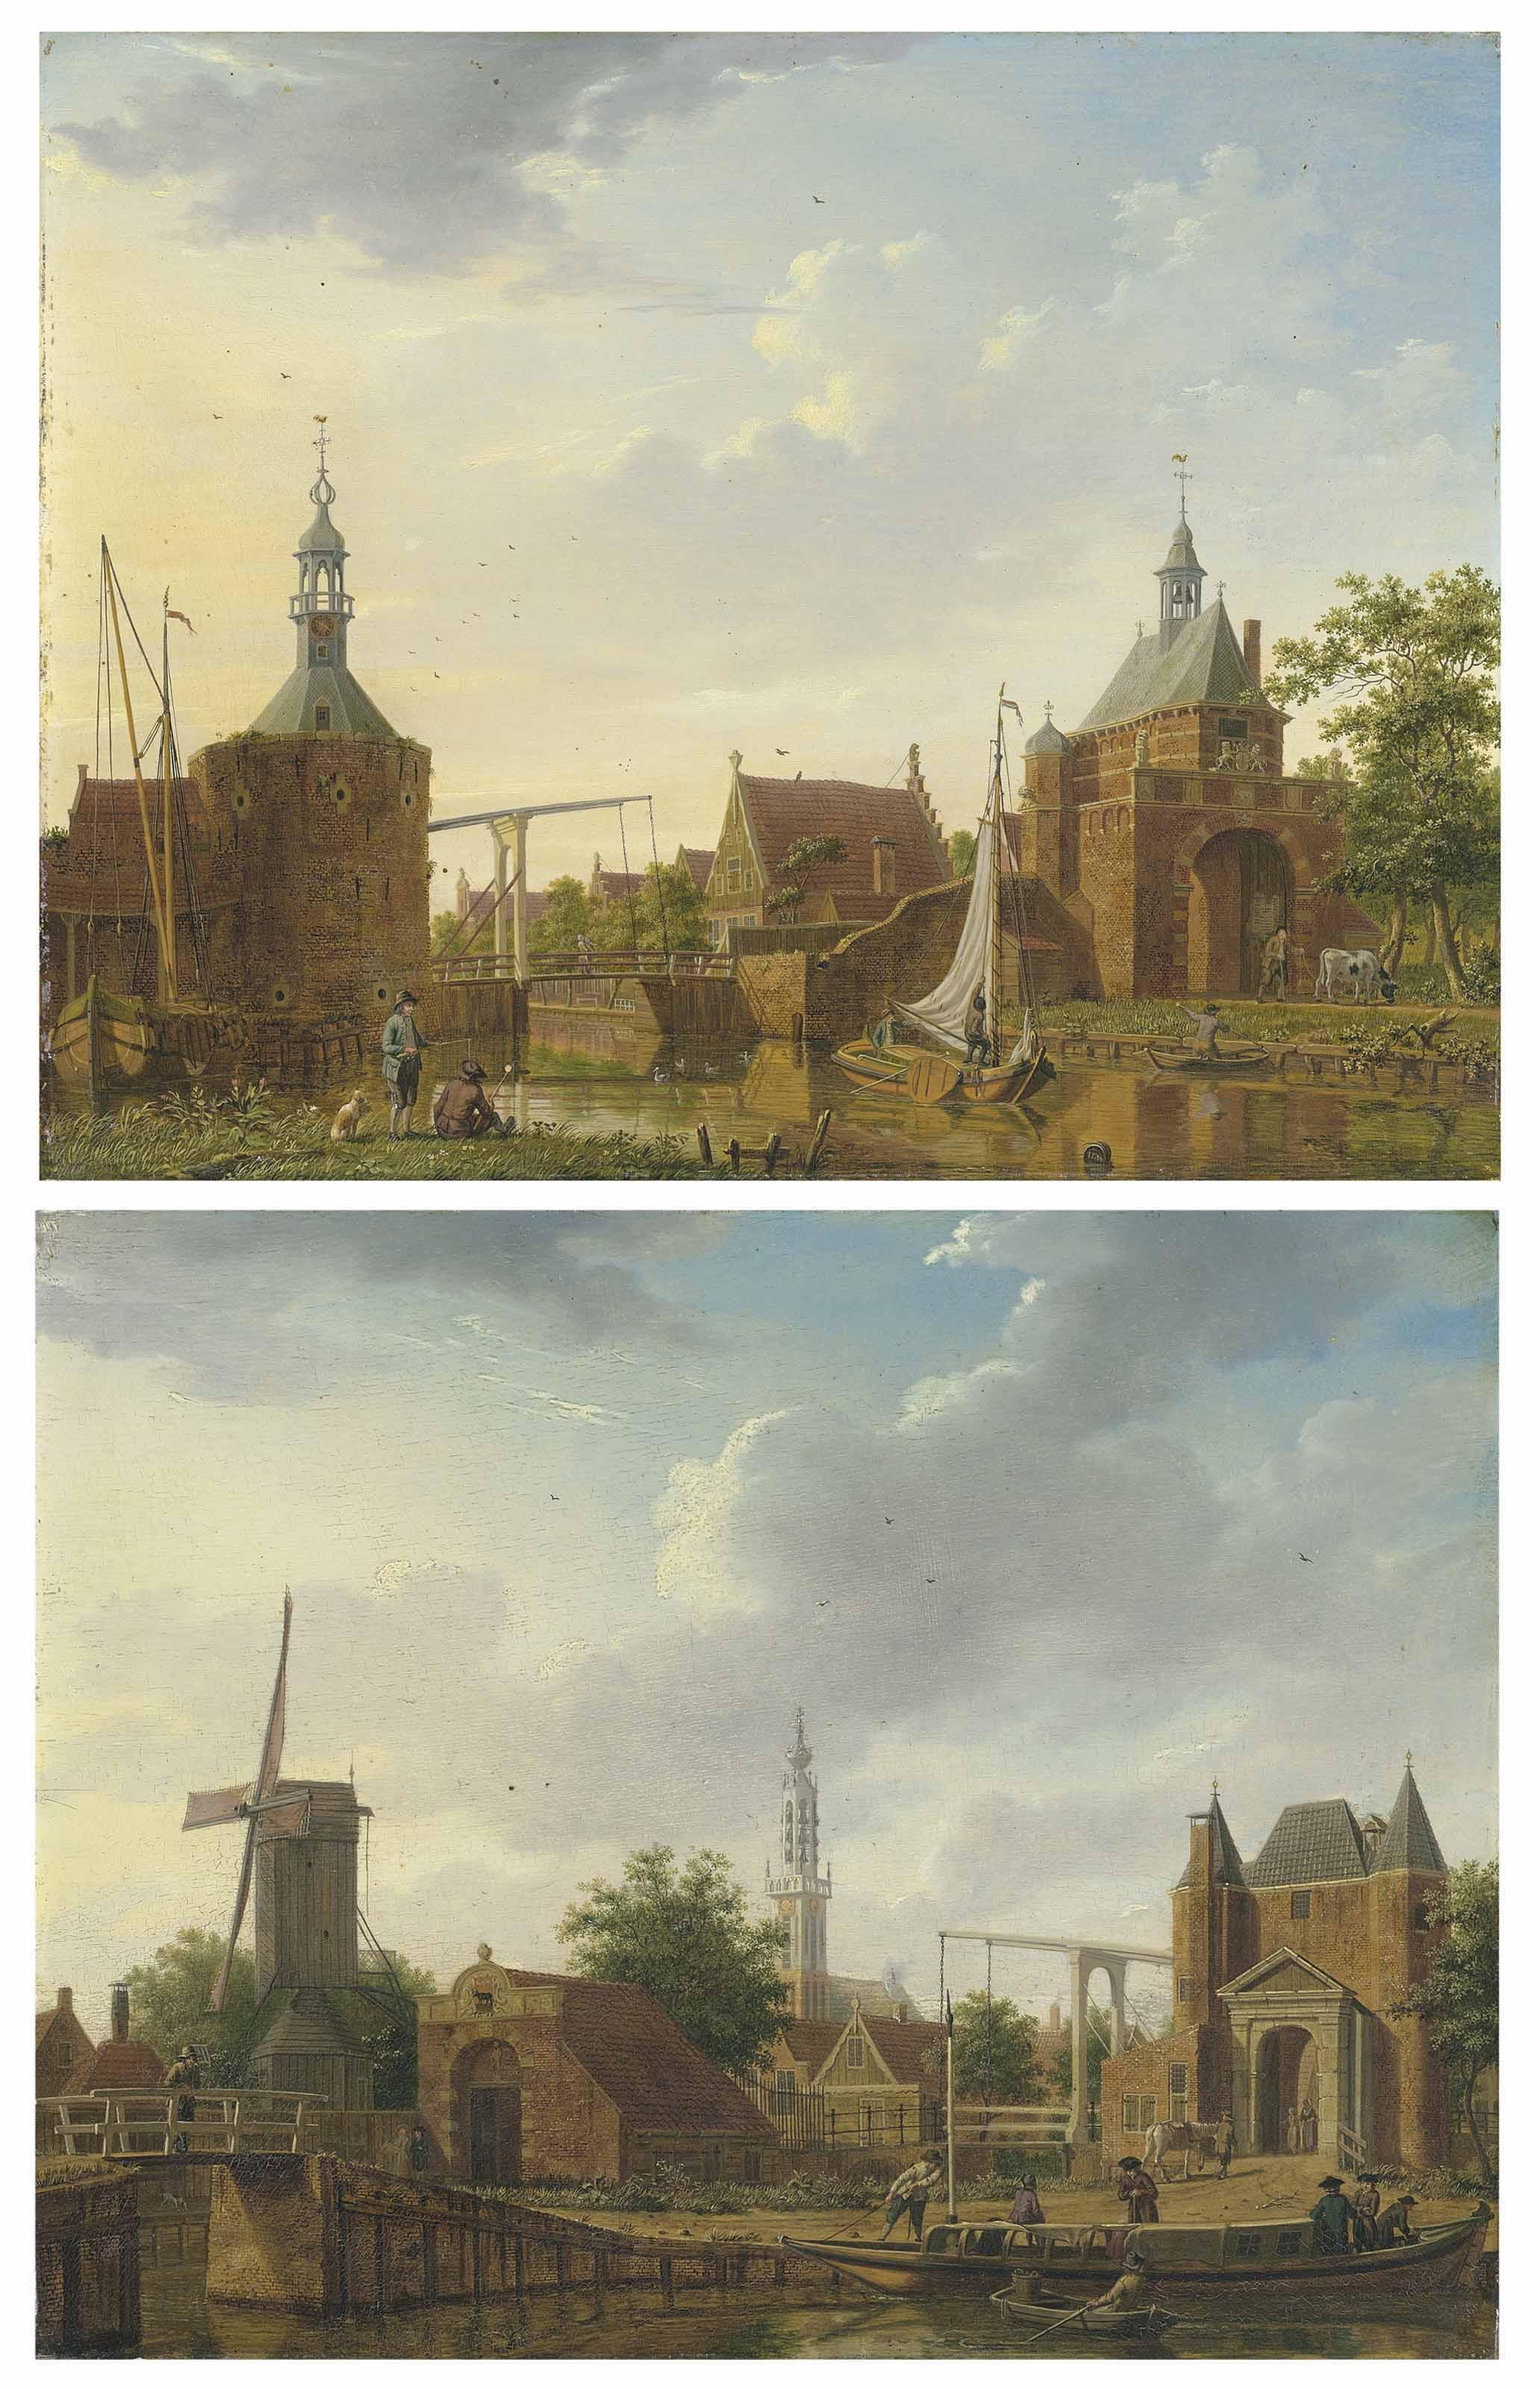 Isaac Ouwater (Amsterdam 1748-